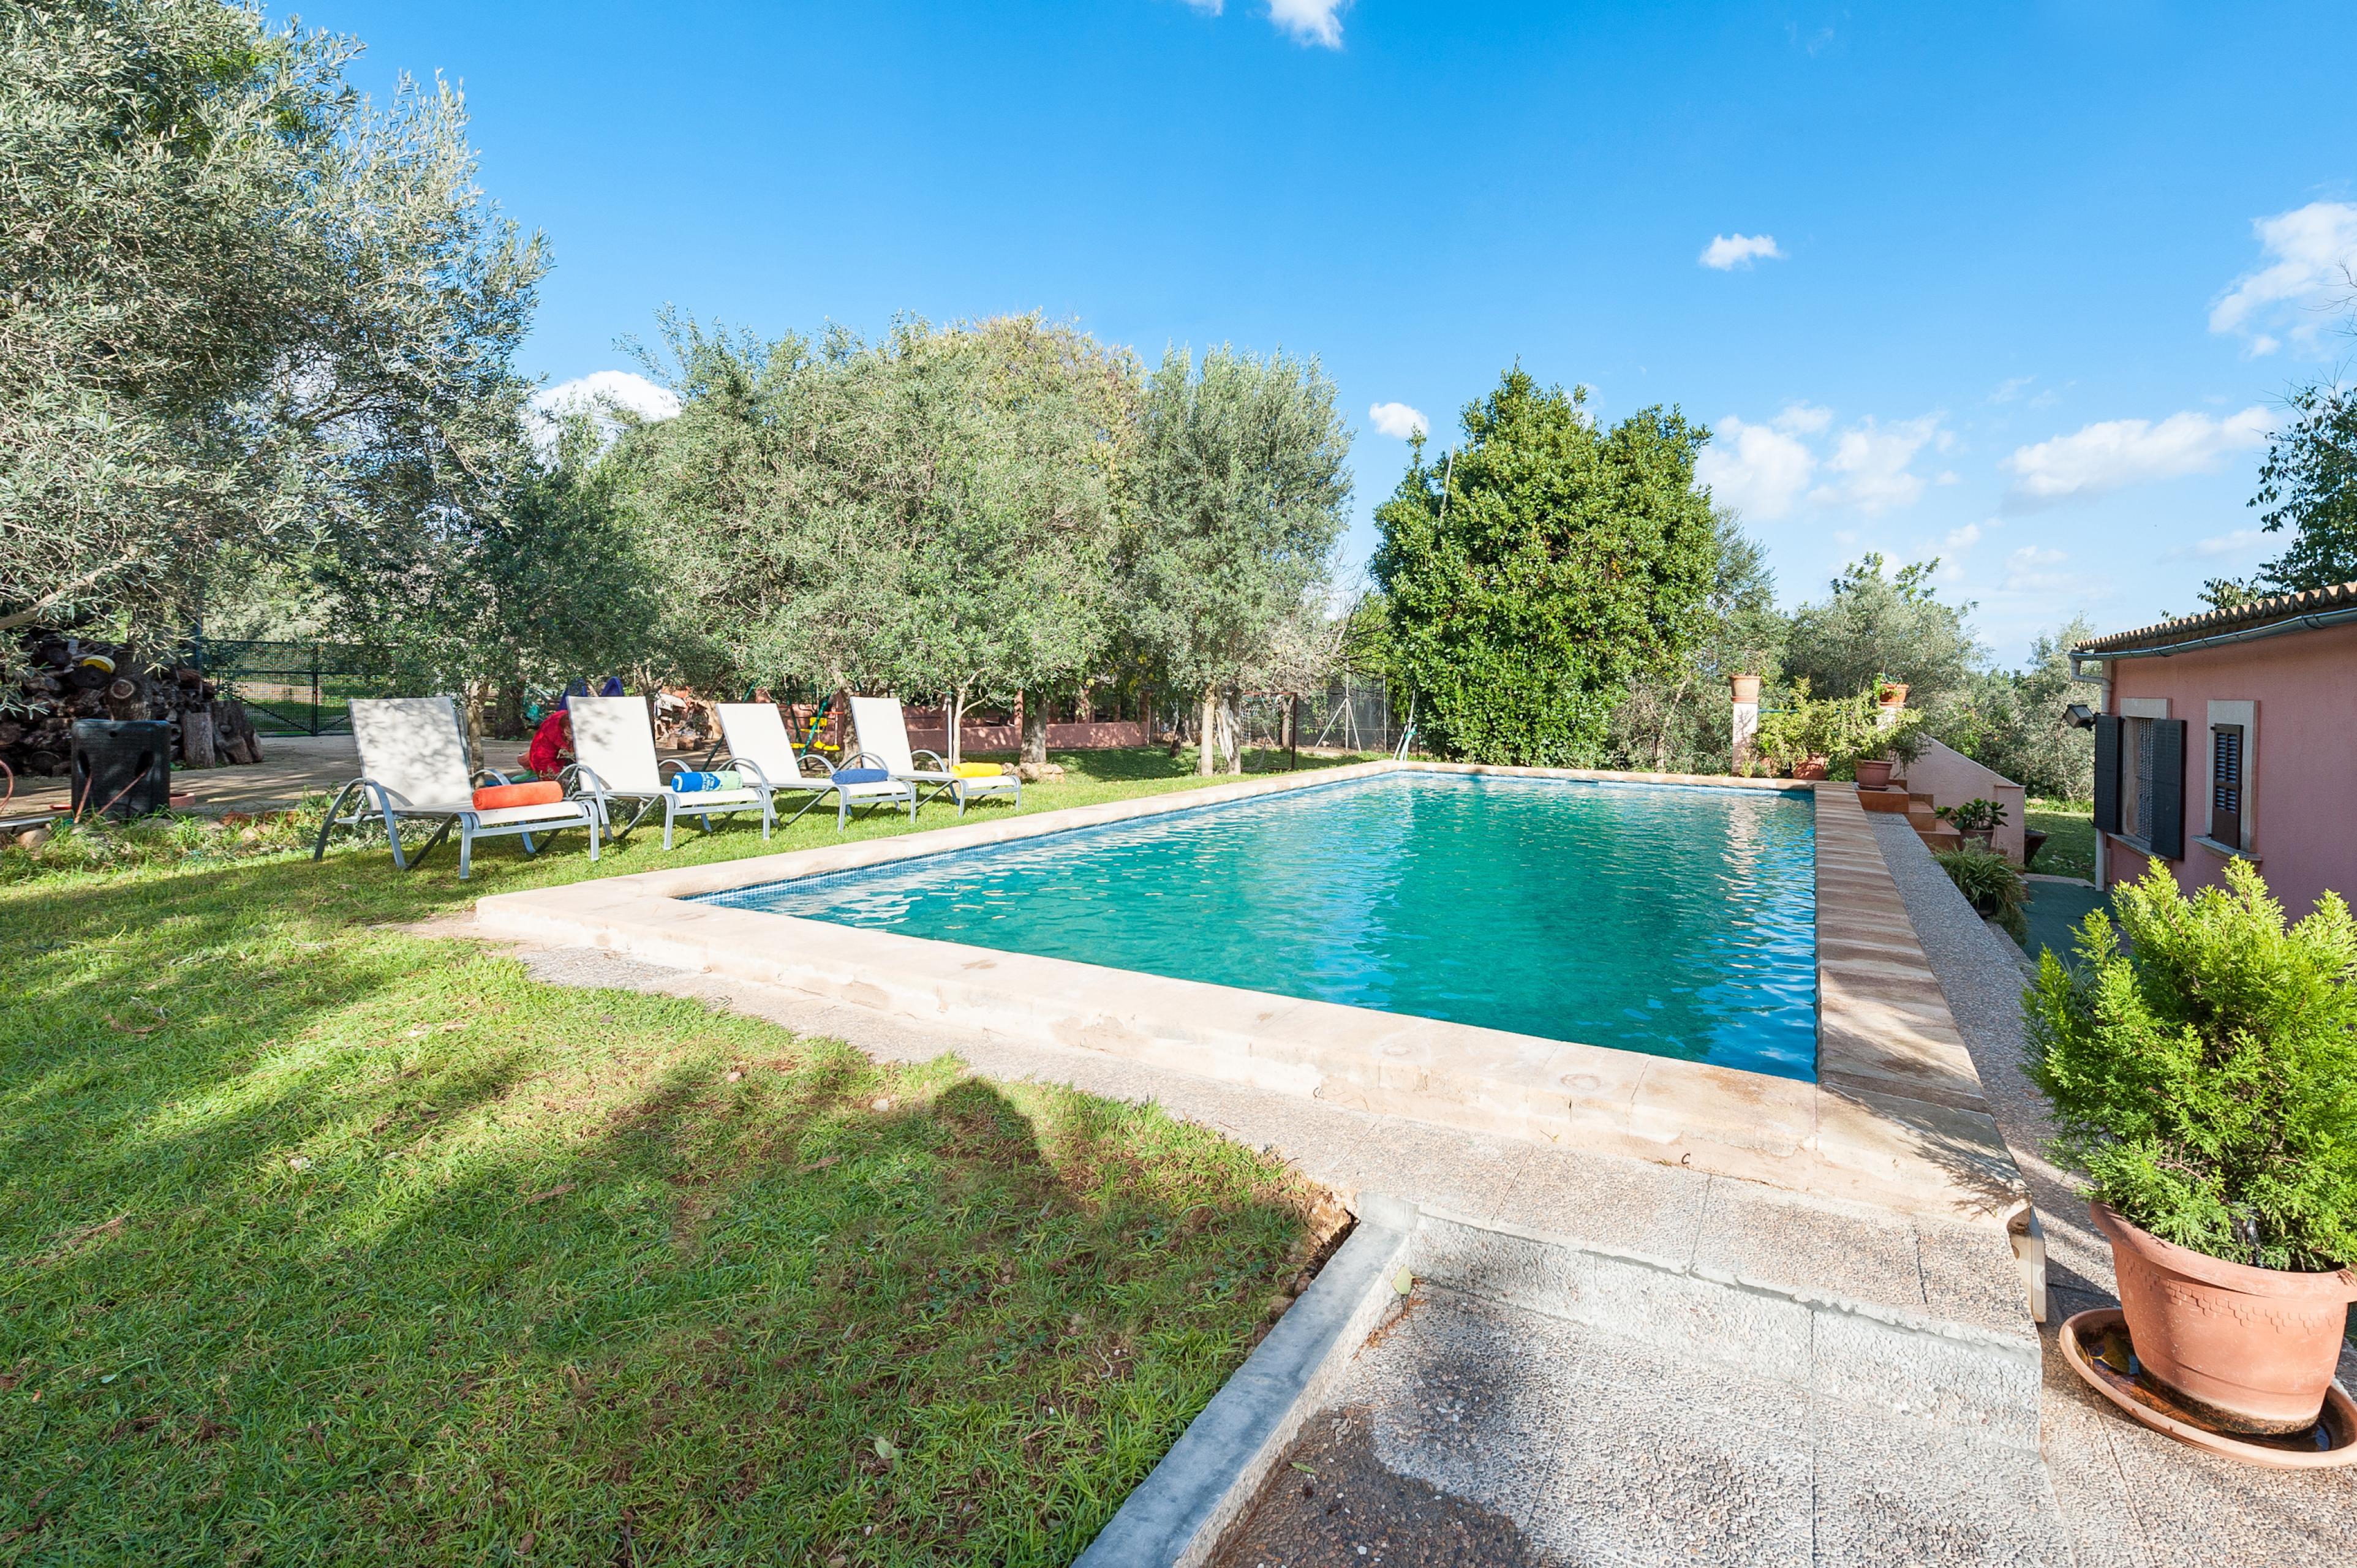 Maison de vacances CA'N LLUC- Alaró- MALLORCA - Kostenloses WLAN (2687507), Alaro, Majorque, Iles Baléares, Espagne, image 2